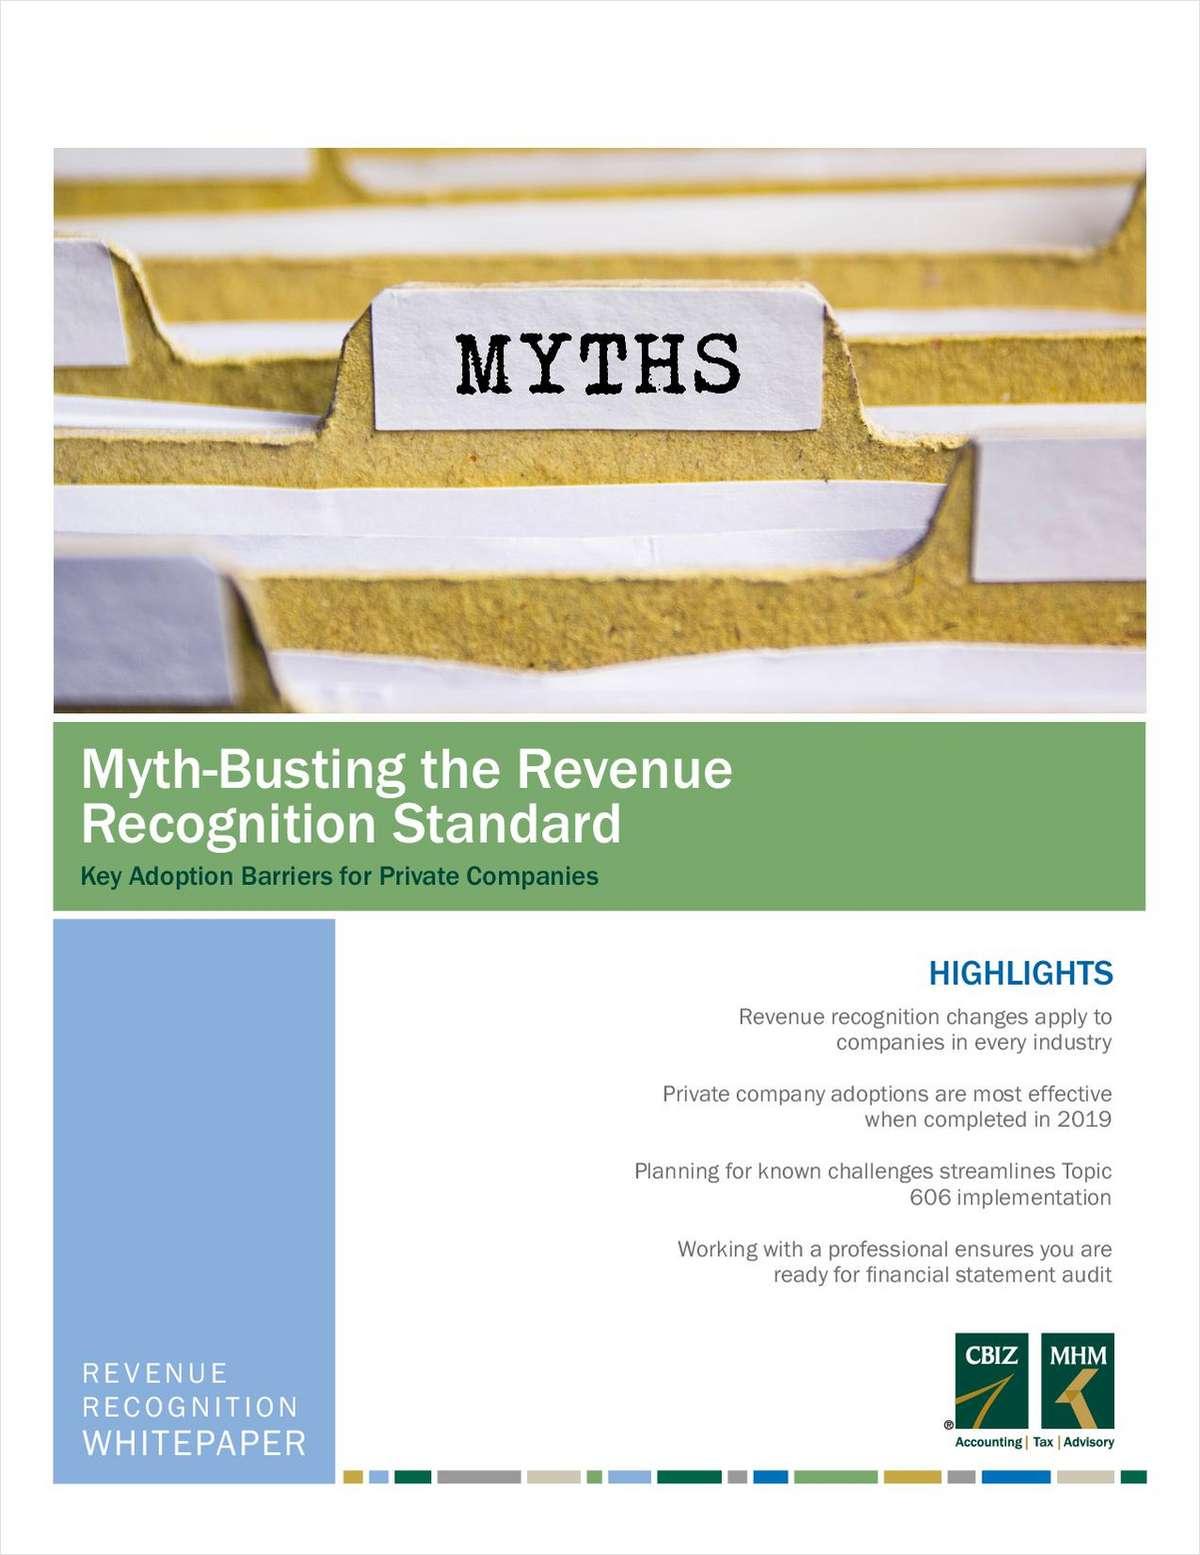 Myth-Busting the Revenue Recognition Standard